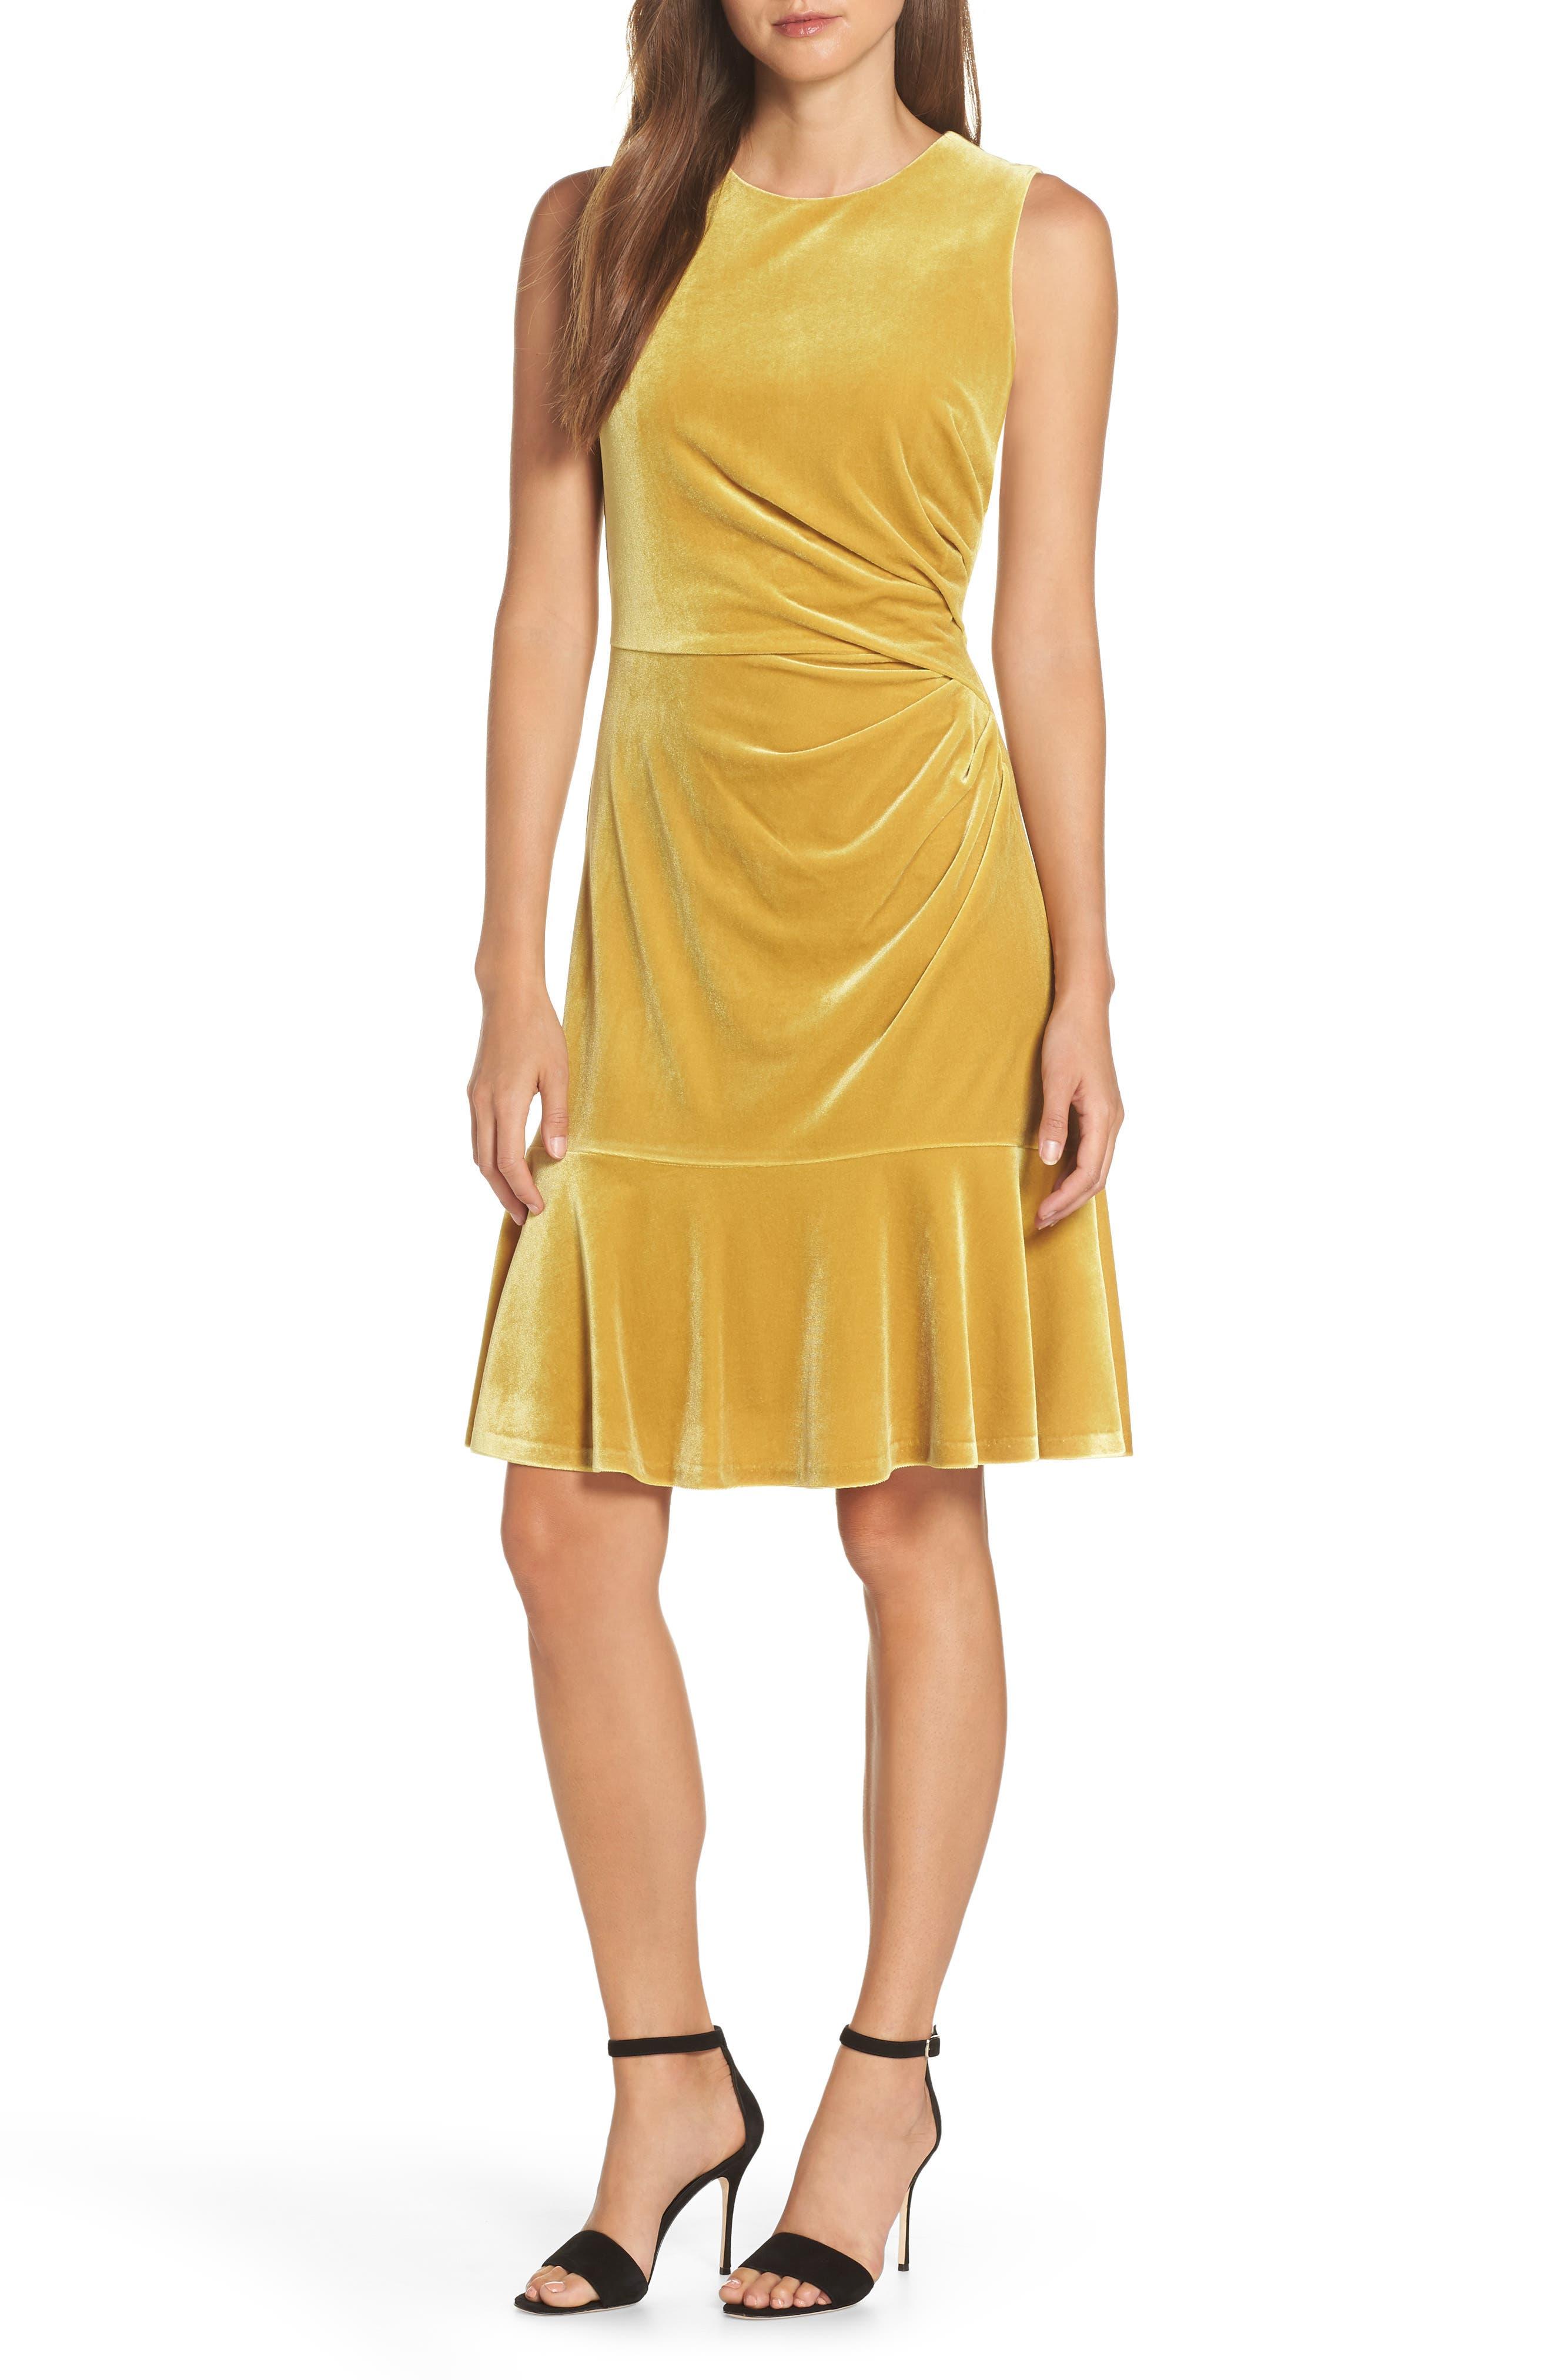 Butter Yellow Dresses